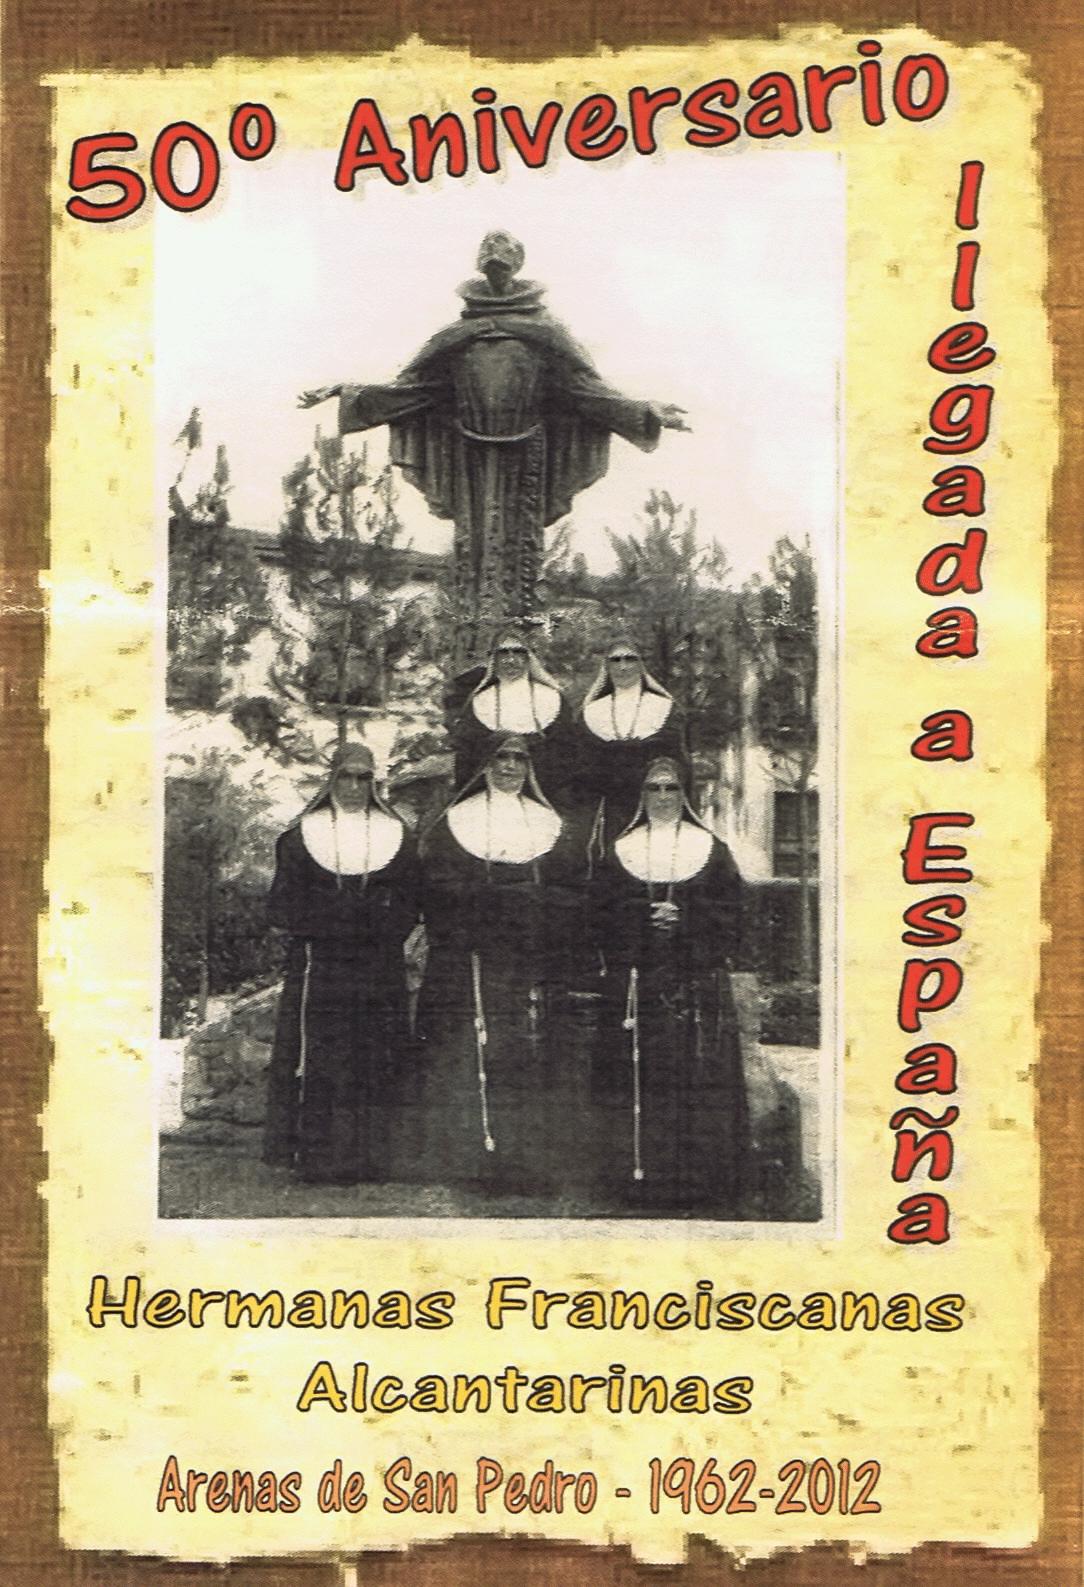 50AniversarioHnasAlcantarinas